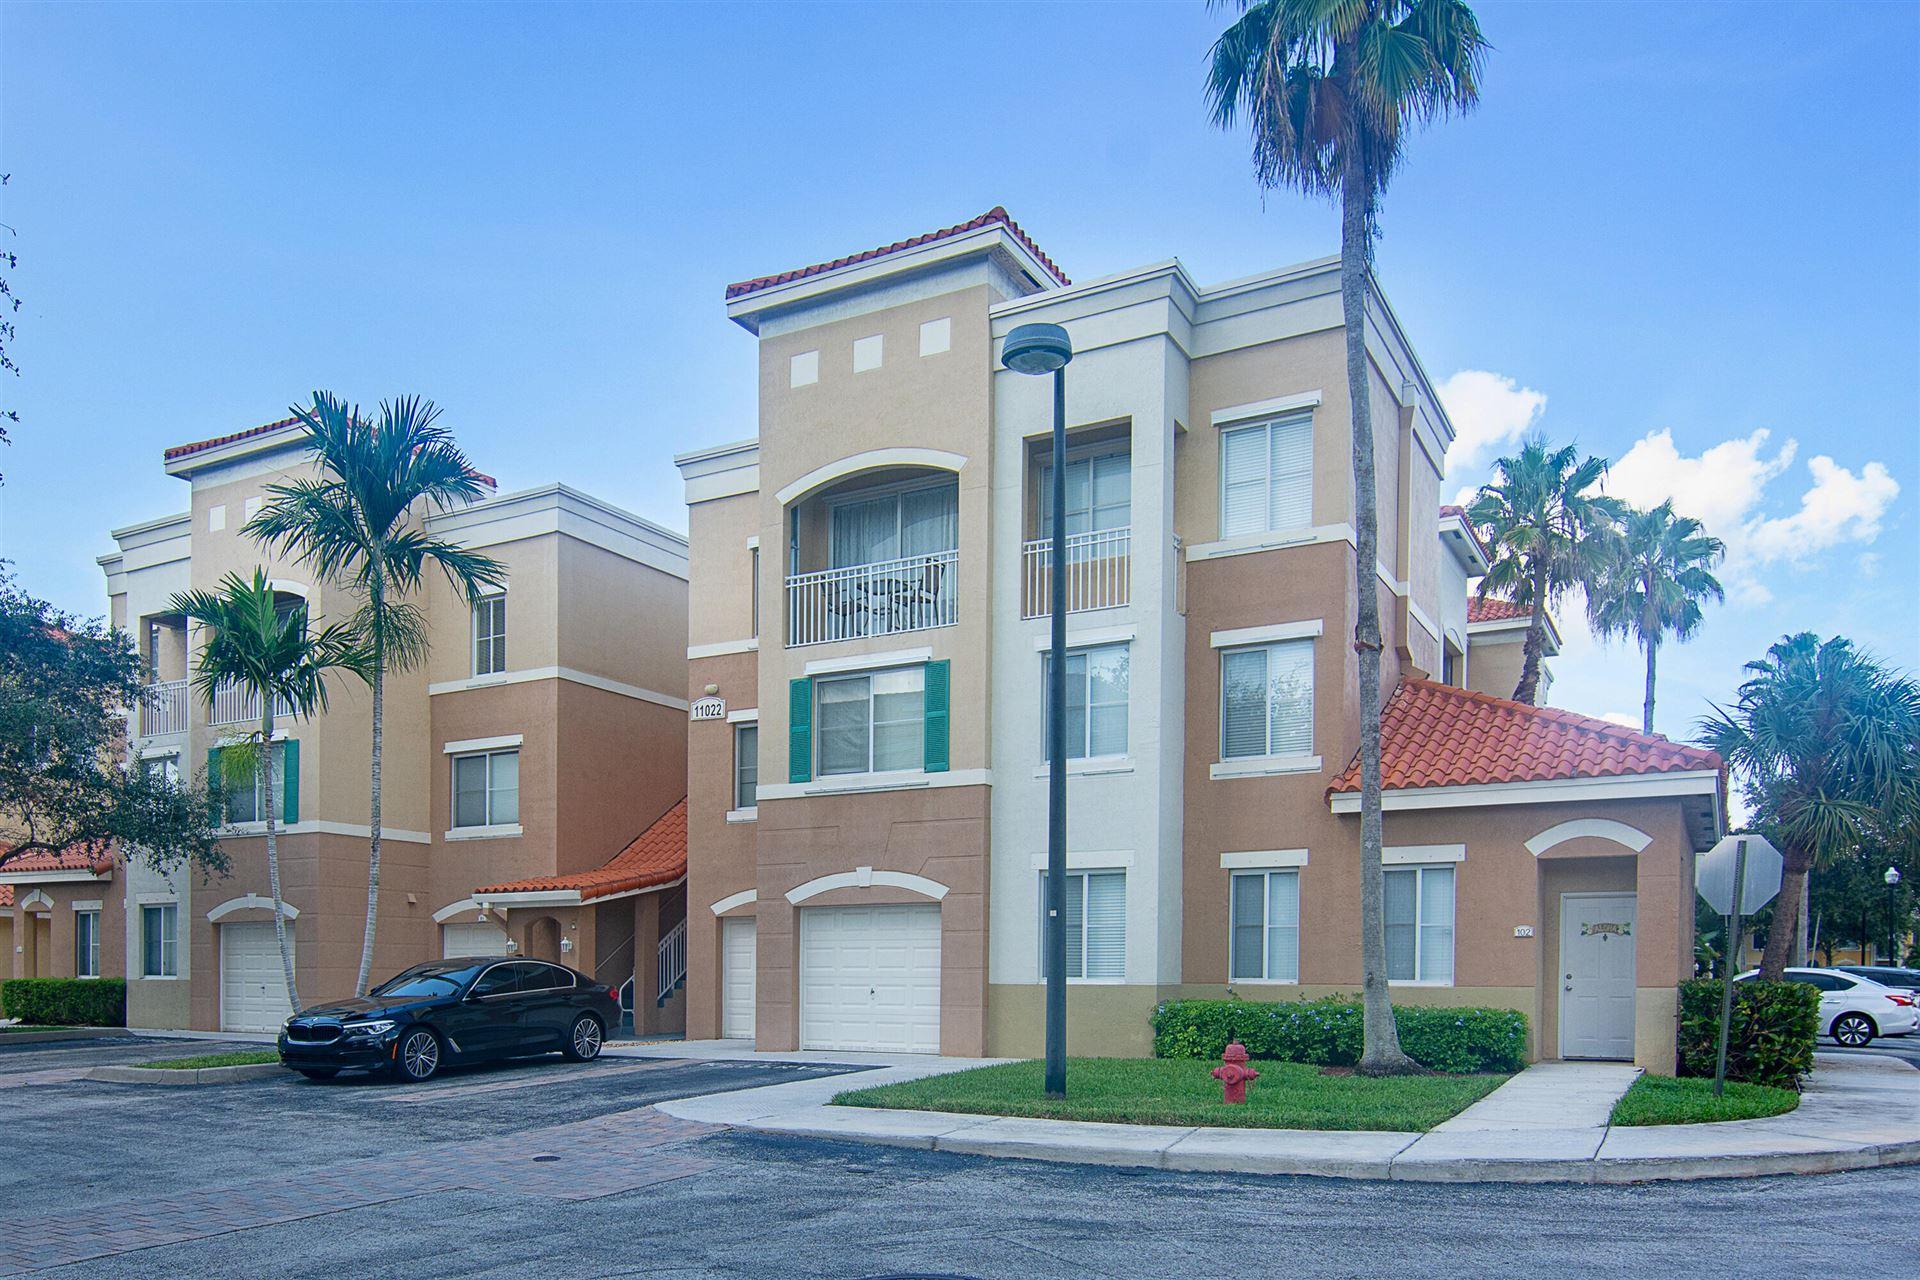 Photo of 11022 Legacy Drive #301, Palm Beach Gardens, FL 33410 (MLS # RX-10746642)